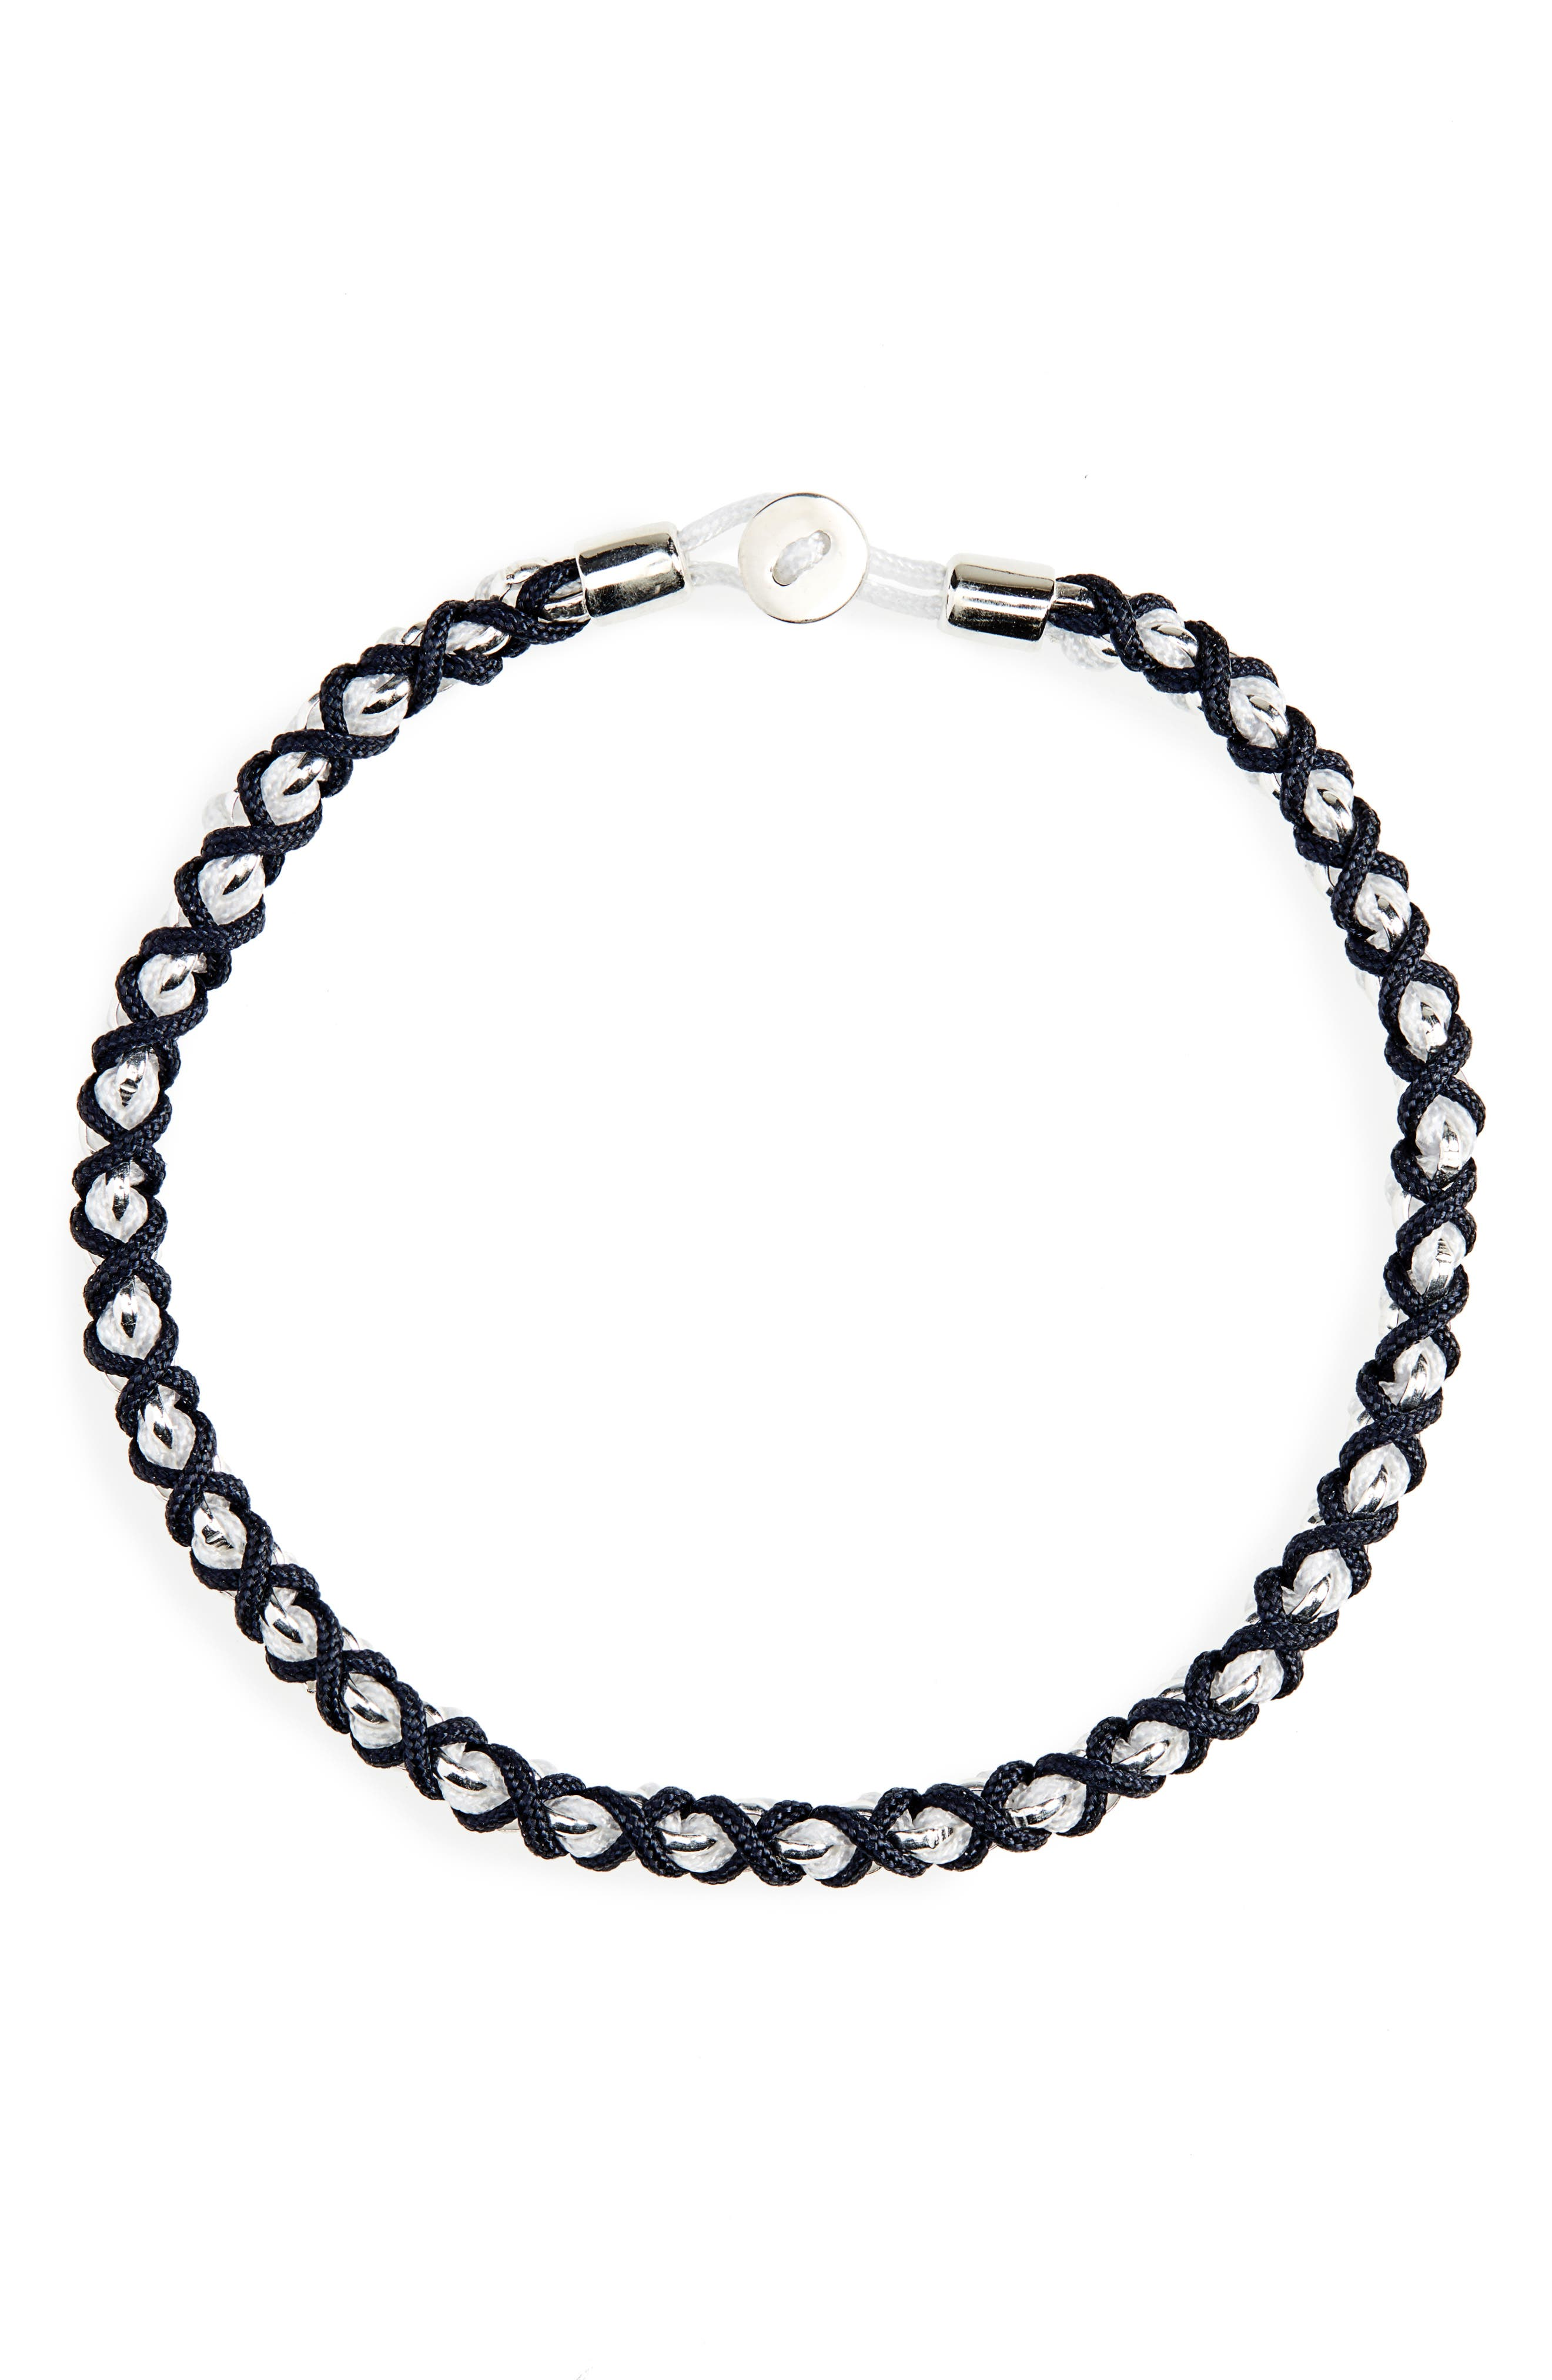 MIANSAI, Nexus Chain Bracelet, Main thumbnail 1, color, NAVY/ WHITE